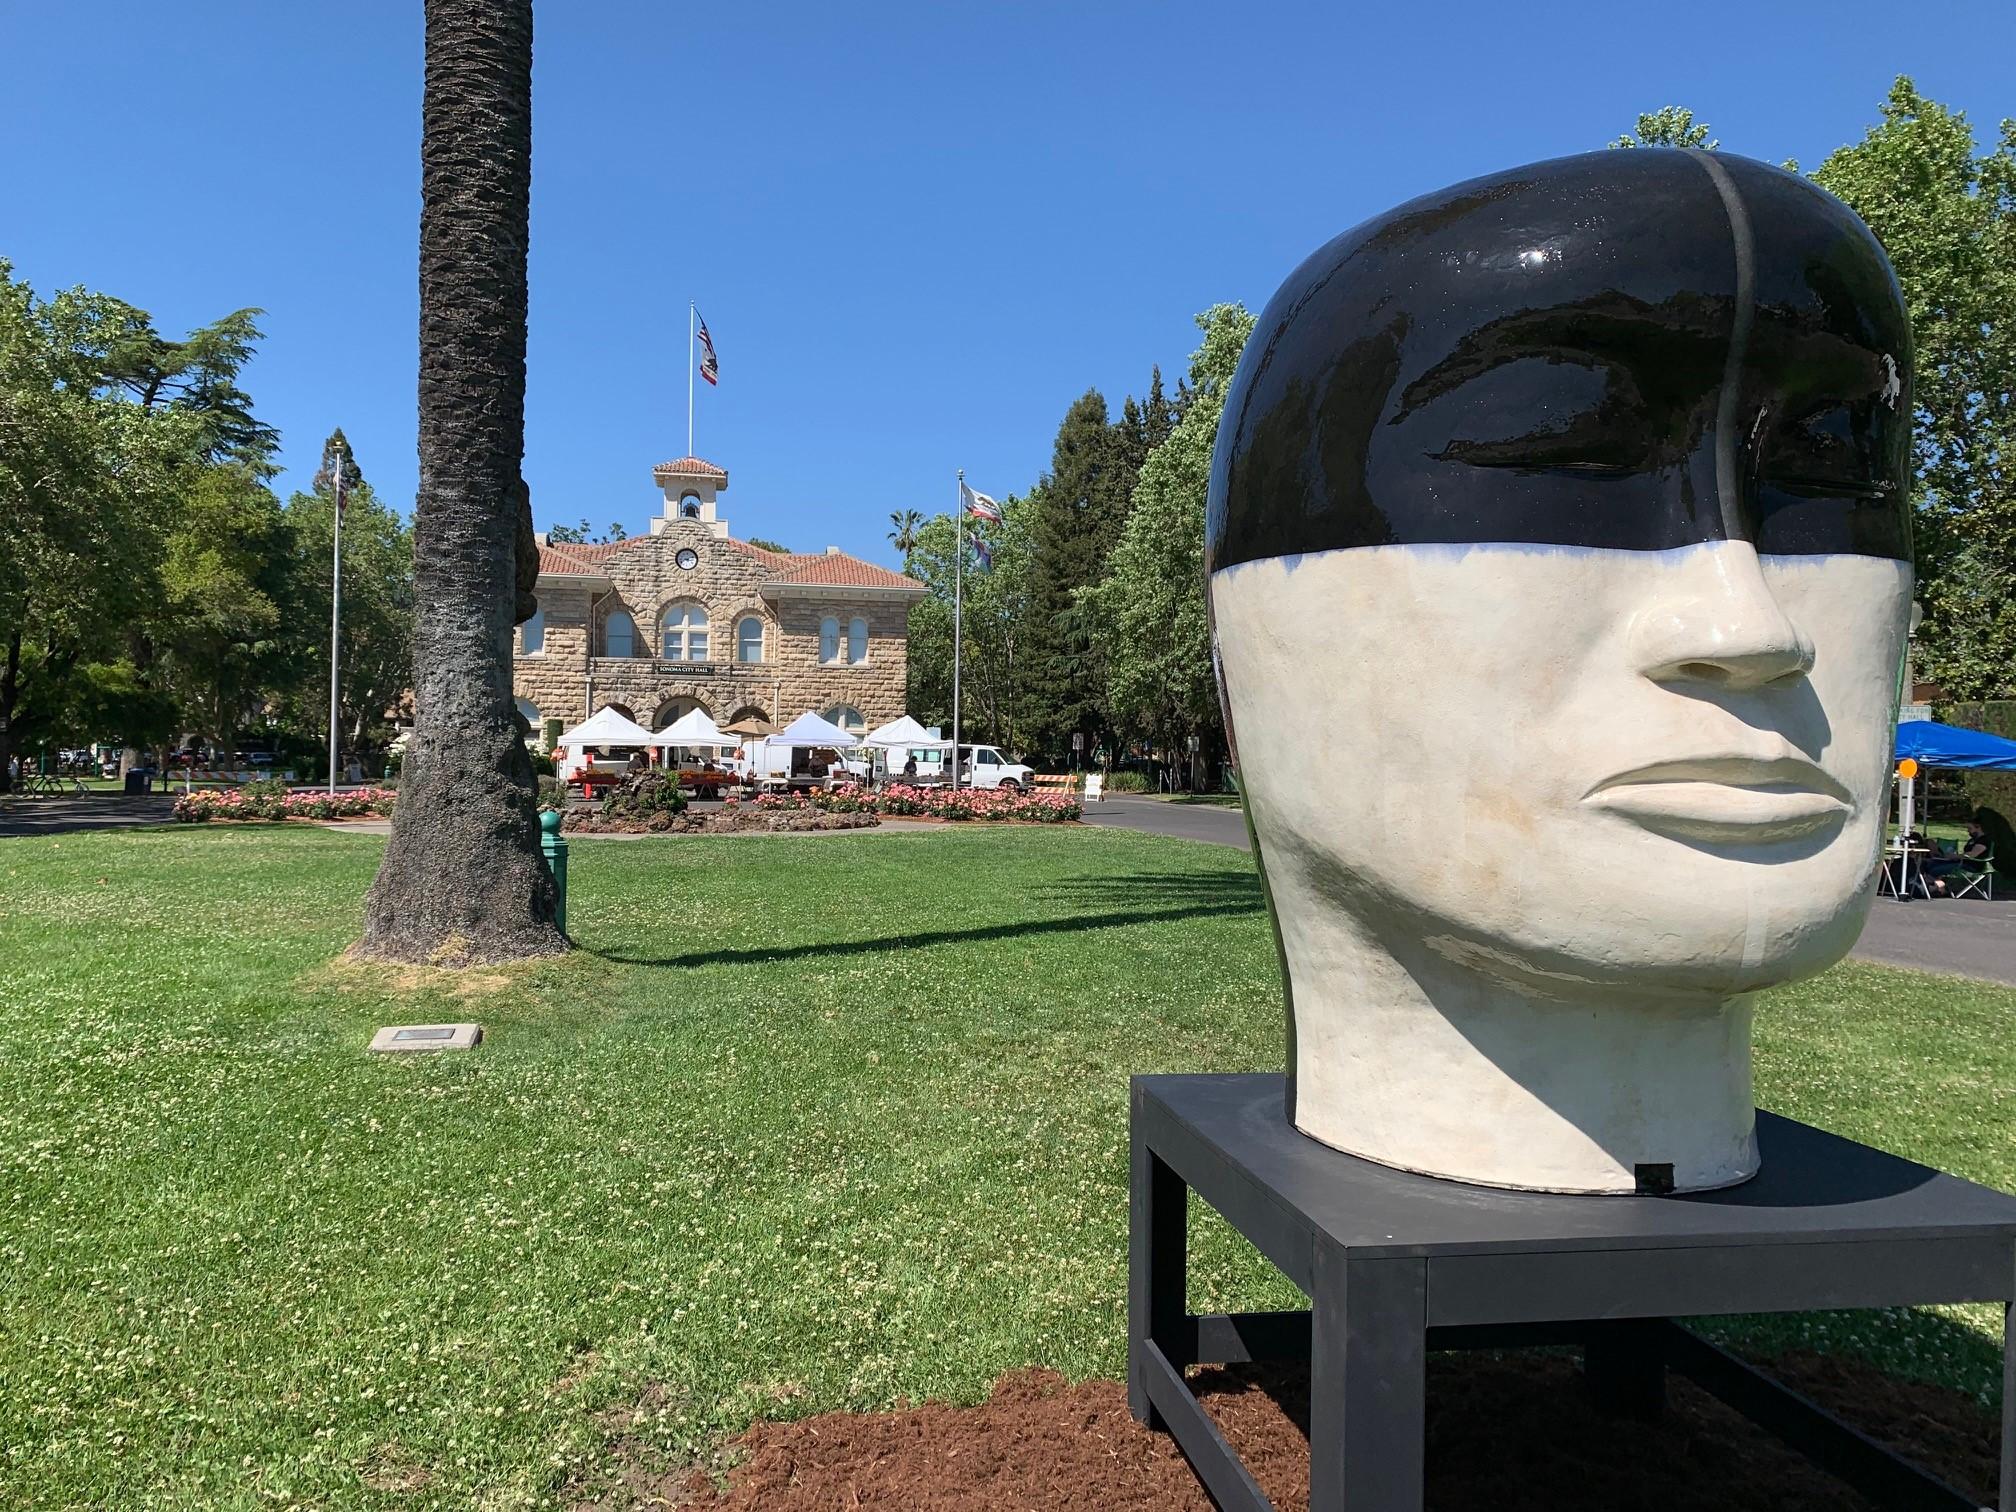 A delicate balance art exhibition at the Sonoma Plaza